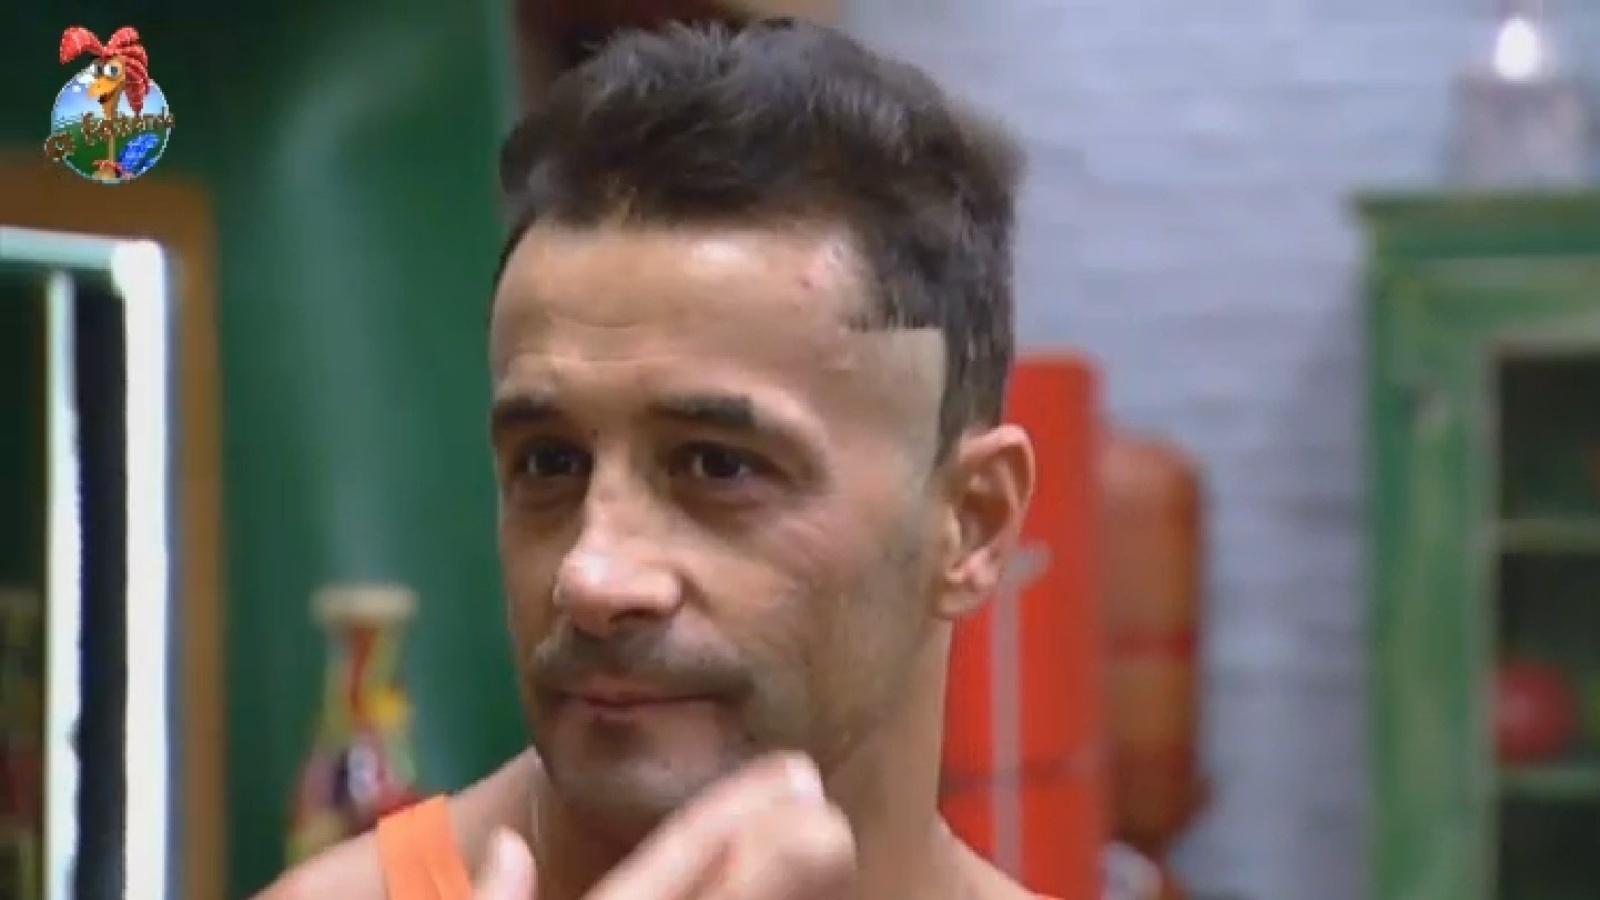 2.ago.2013 - Marcos Oliver erra ao cortar o cabelo e raspa a sobrancelha